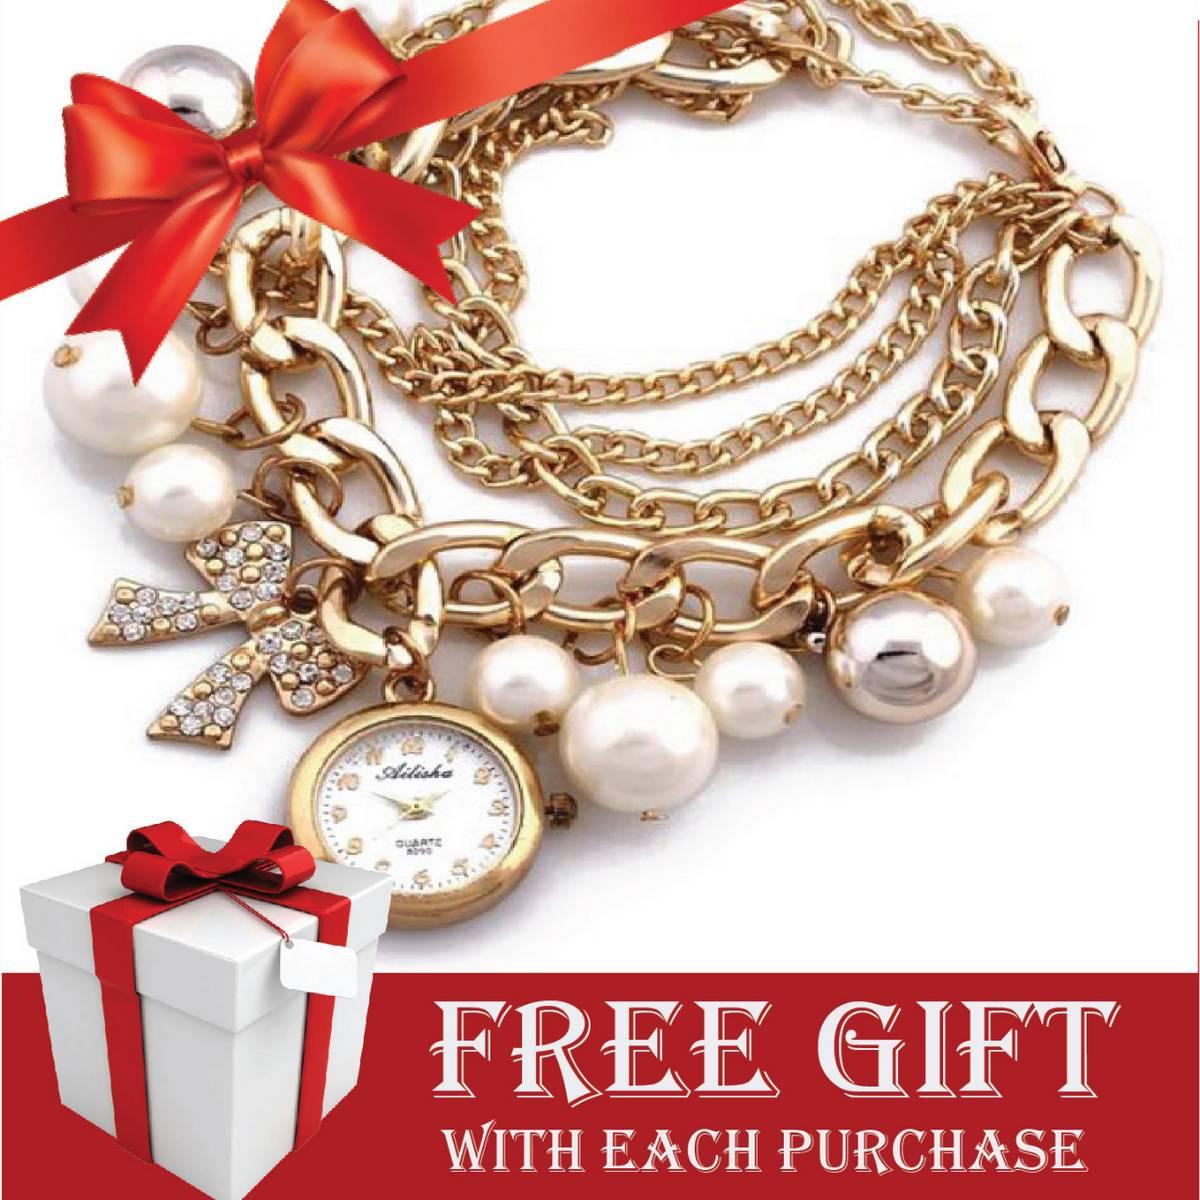 Girls Bracelate Watch With FREE GIFT - Pearl Bracelet Watch for Girls